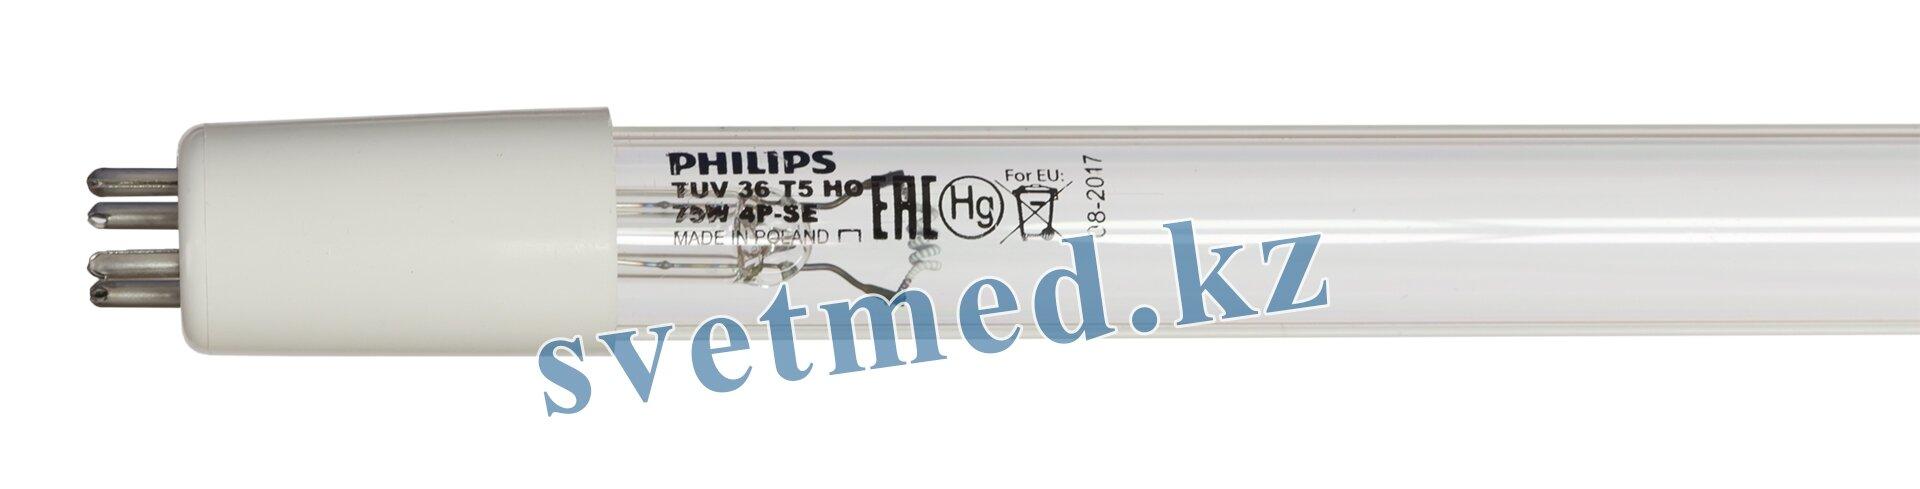 Лампа бактерицидная PH TUV 36W T5 HO 4PSE UNP